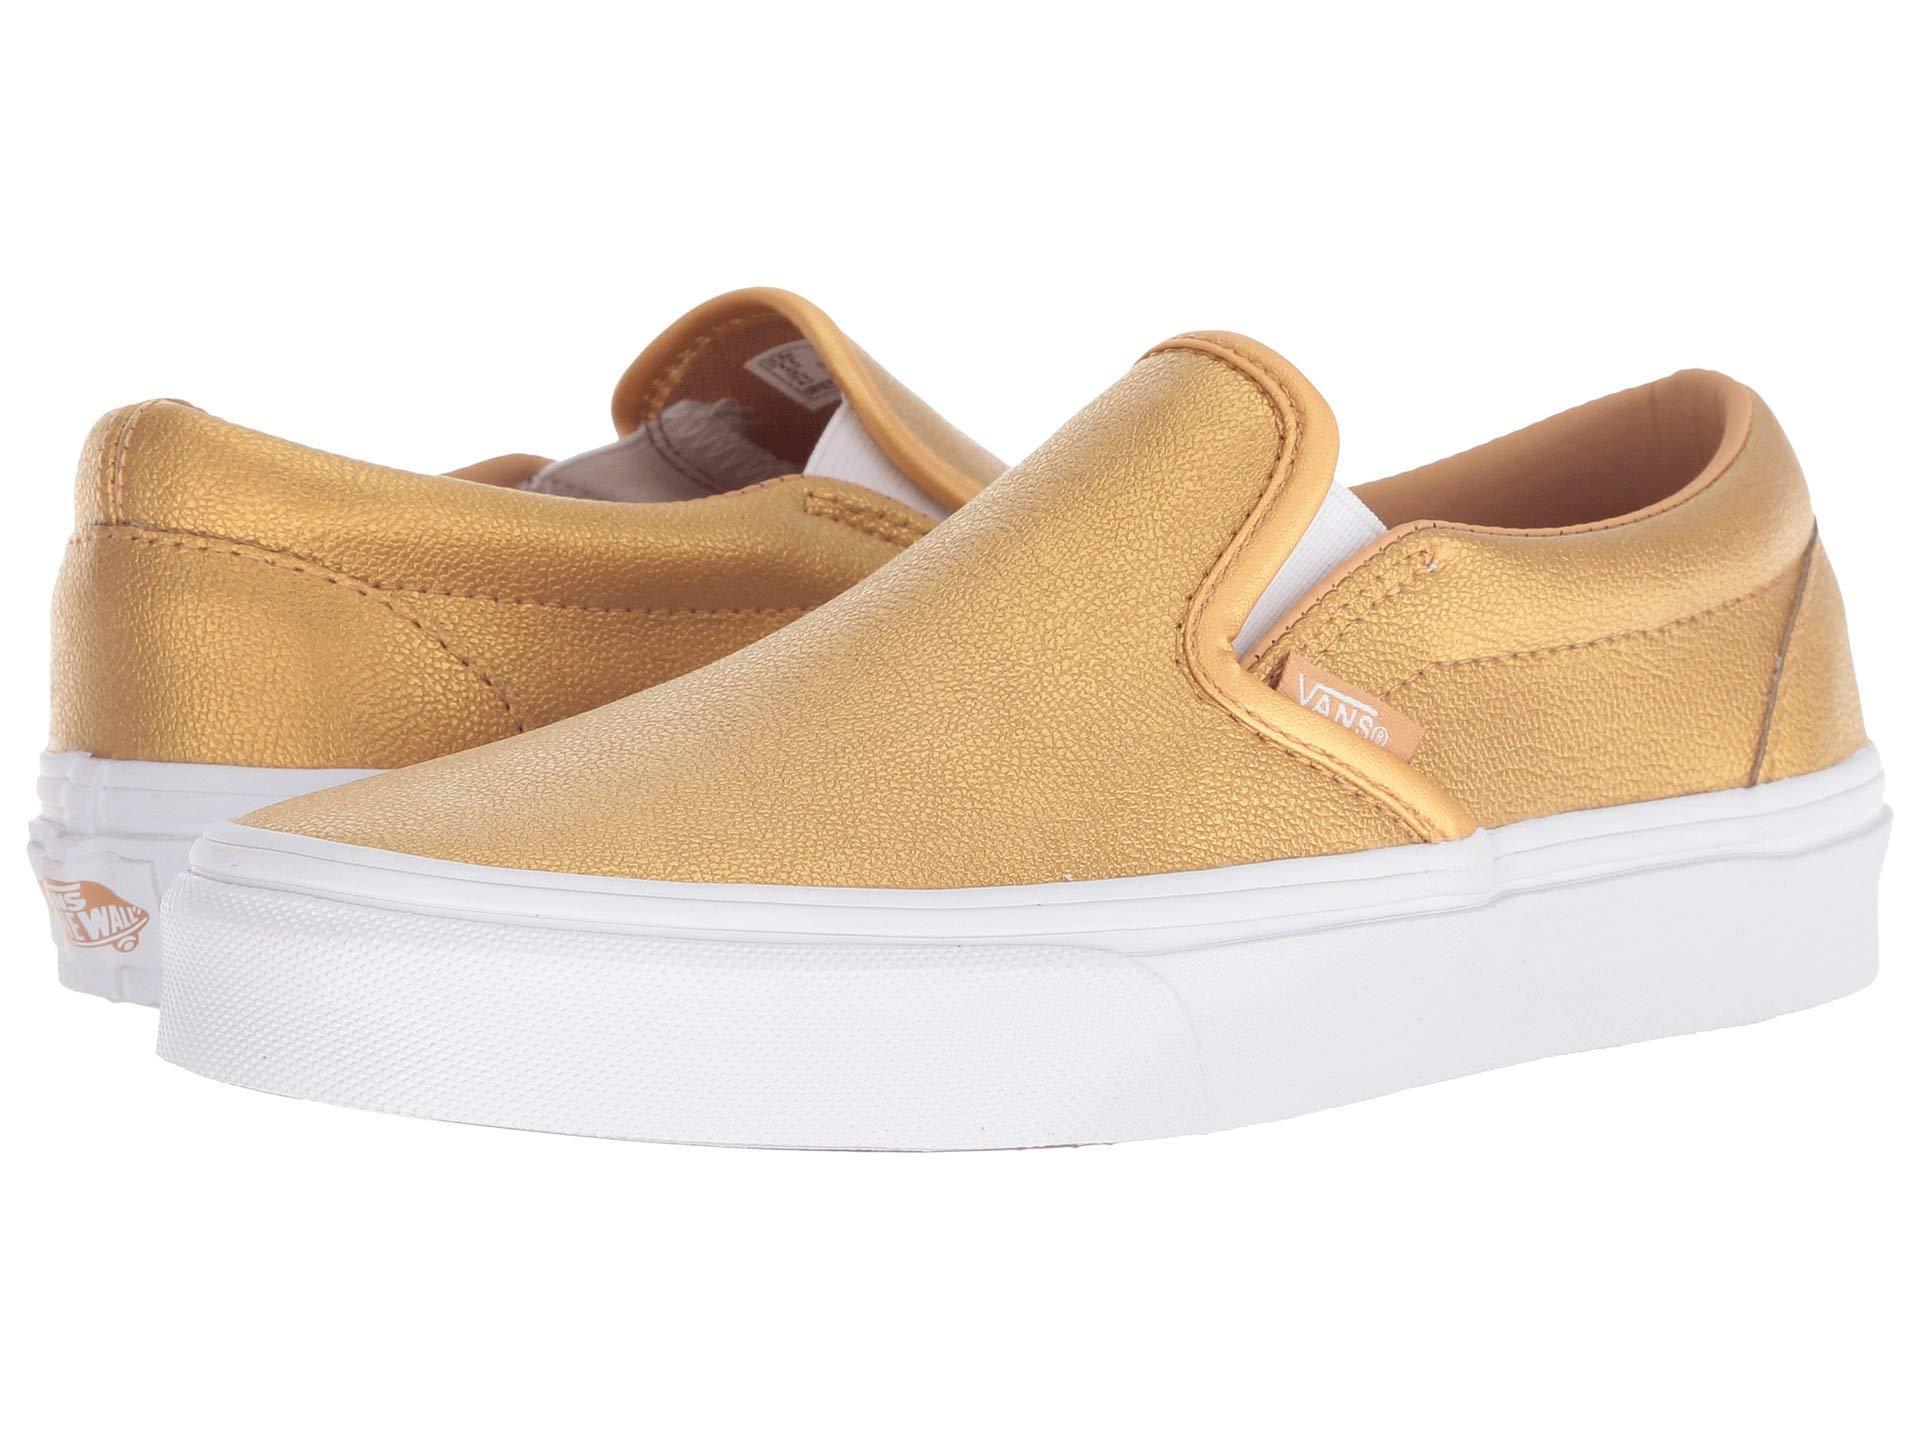 e686f0a5fc Galleon - Vans Classic Slip-ON Adult s Sneaker Womens Skateboarding-Shoes  VN-A38F7RSQ 8.5M - Metallic Bronze True White